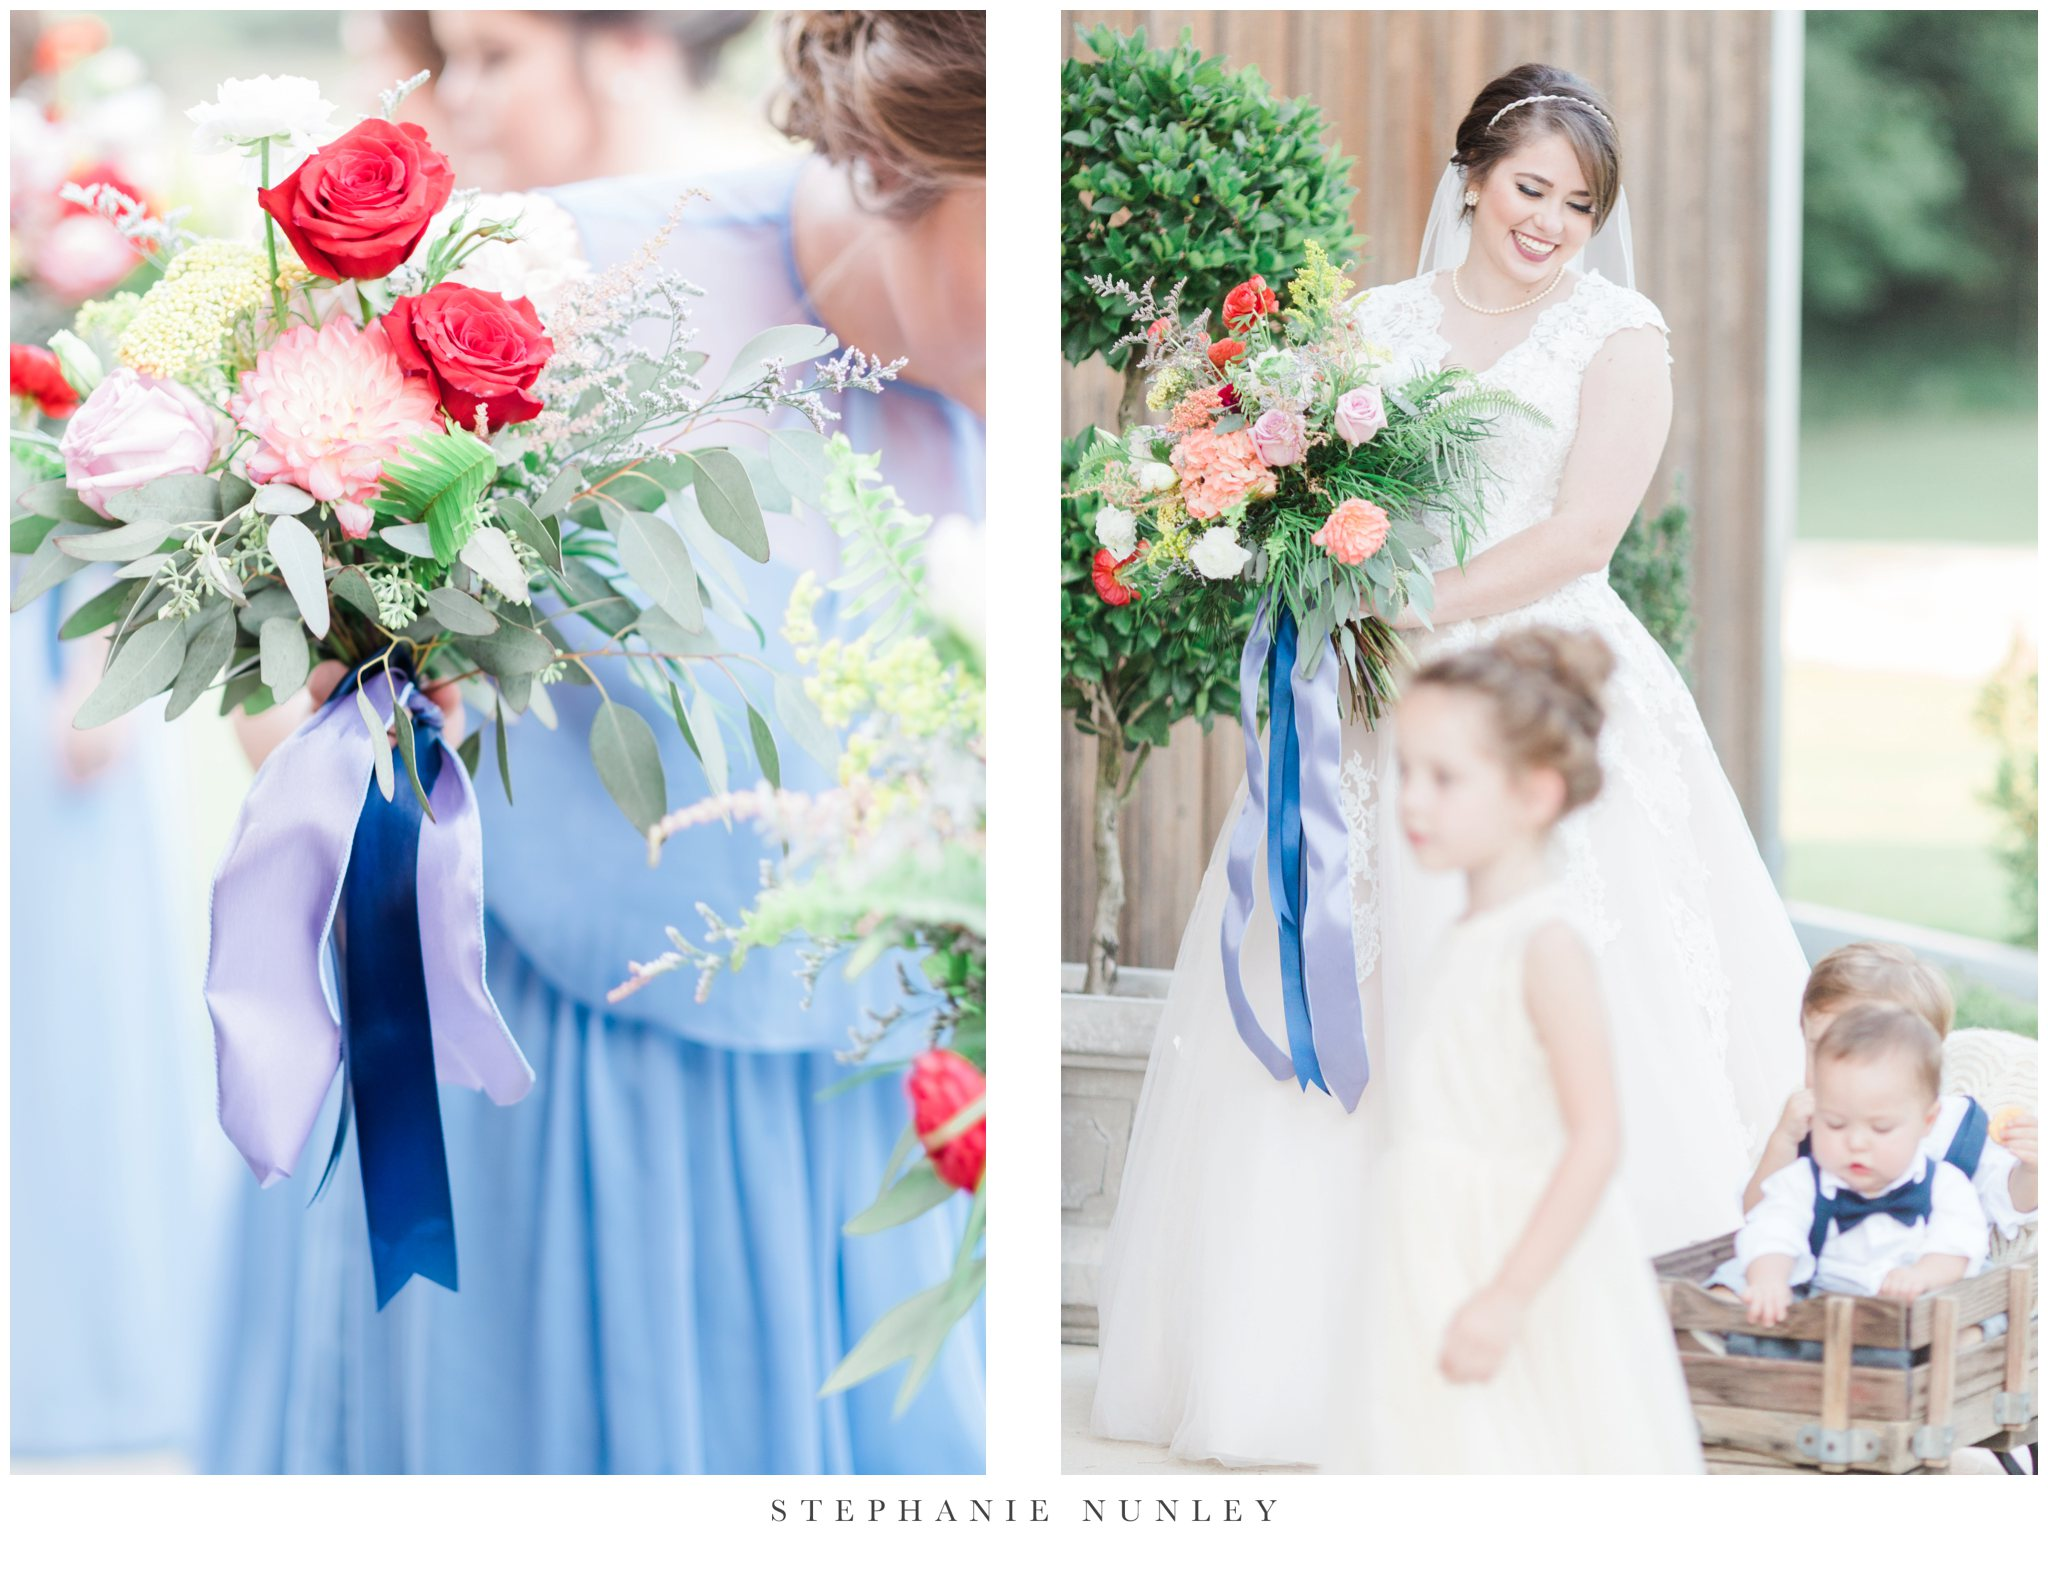 arkansas-wedding-with-lush-wildflower-bouquet-0095.jpg